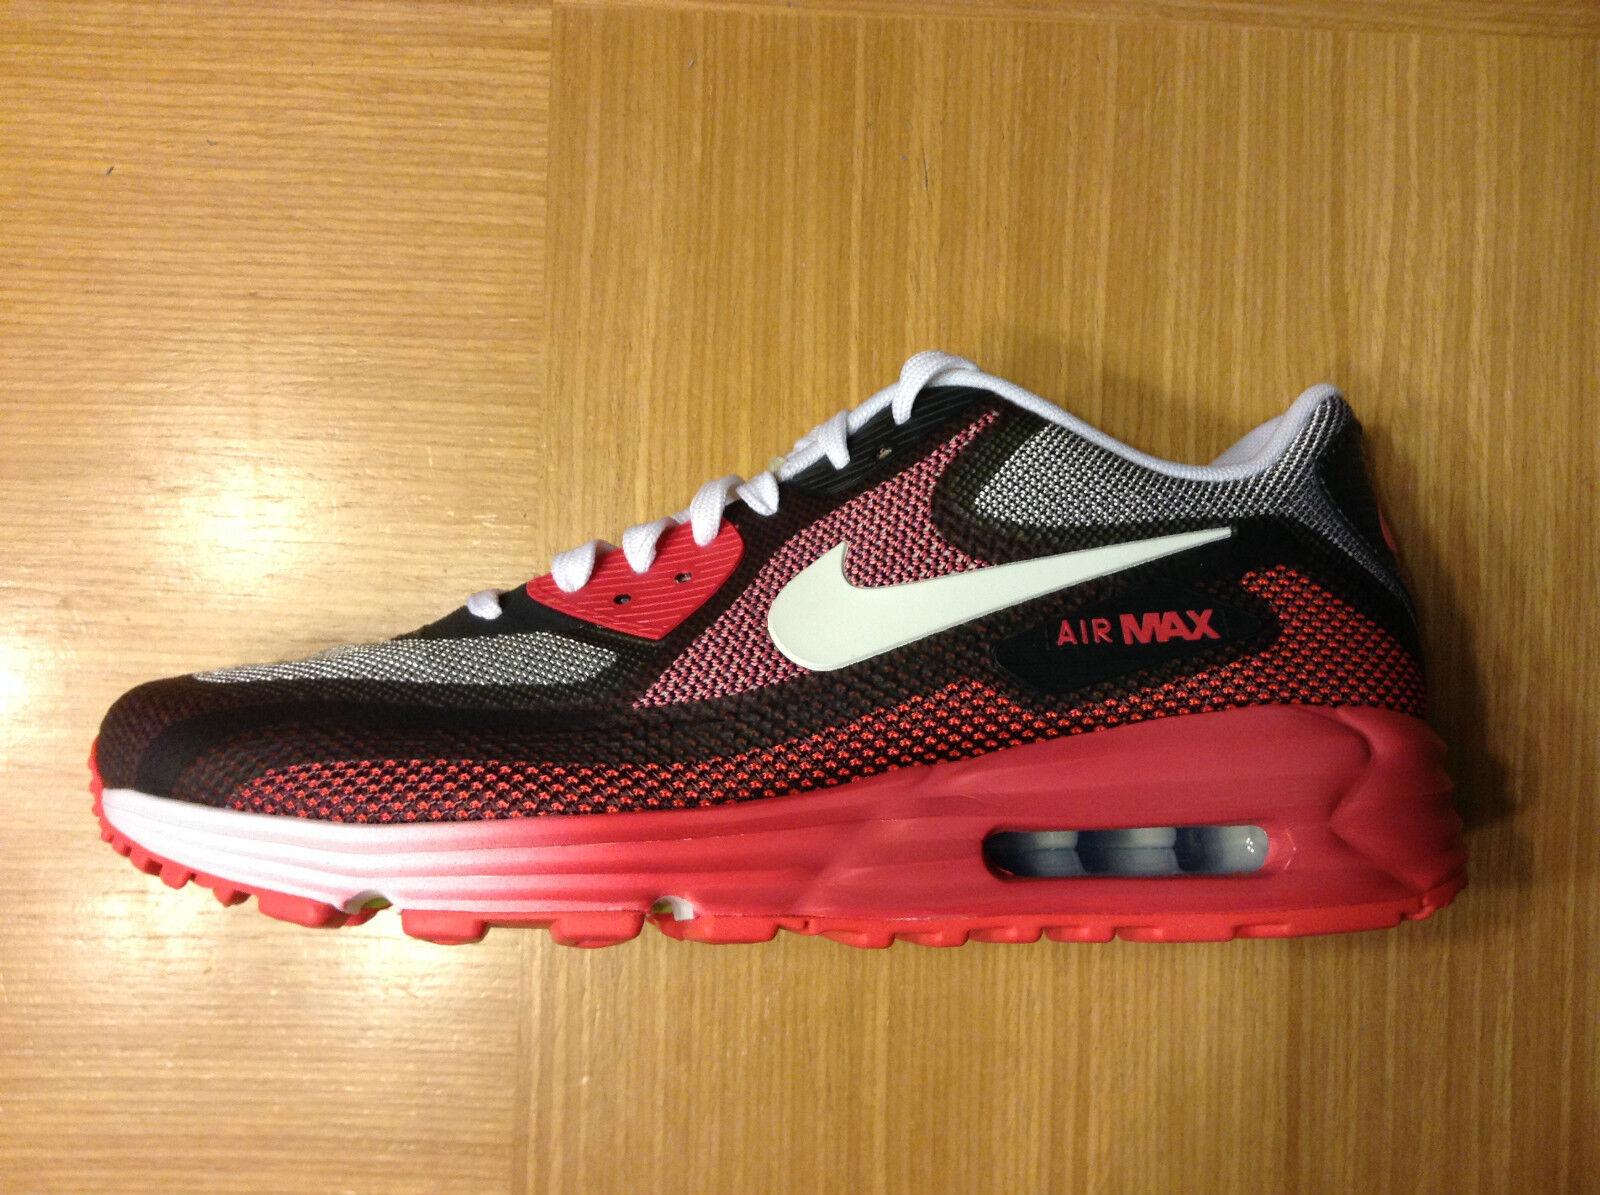 Wmns Nike Air Max Lunar90 - C3.0 Trainers-Geranium/Weiß/Grau/volt -UK 3.5-7 - Lunar90 NEW 935f43